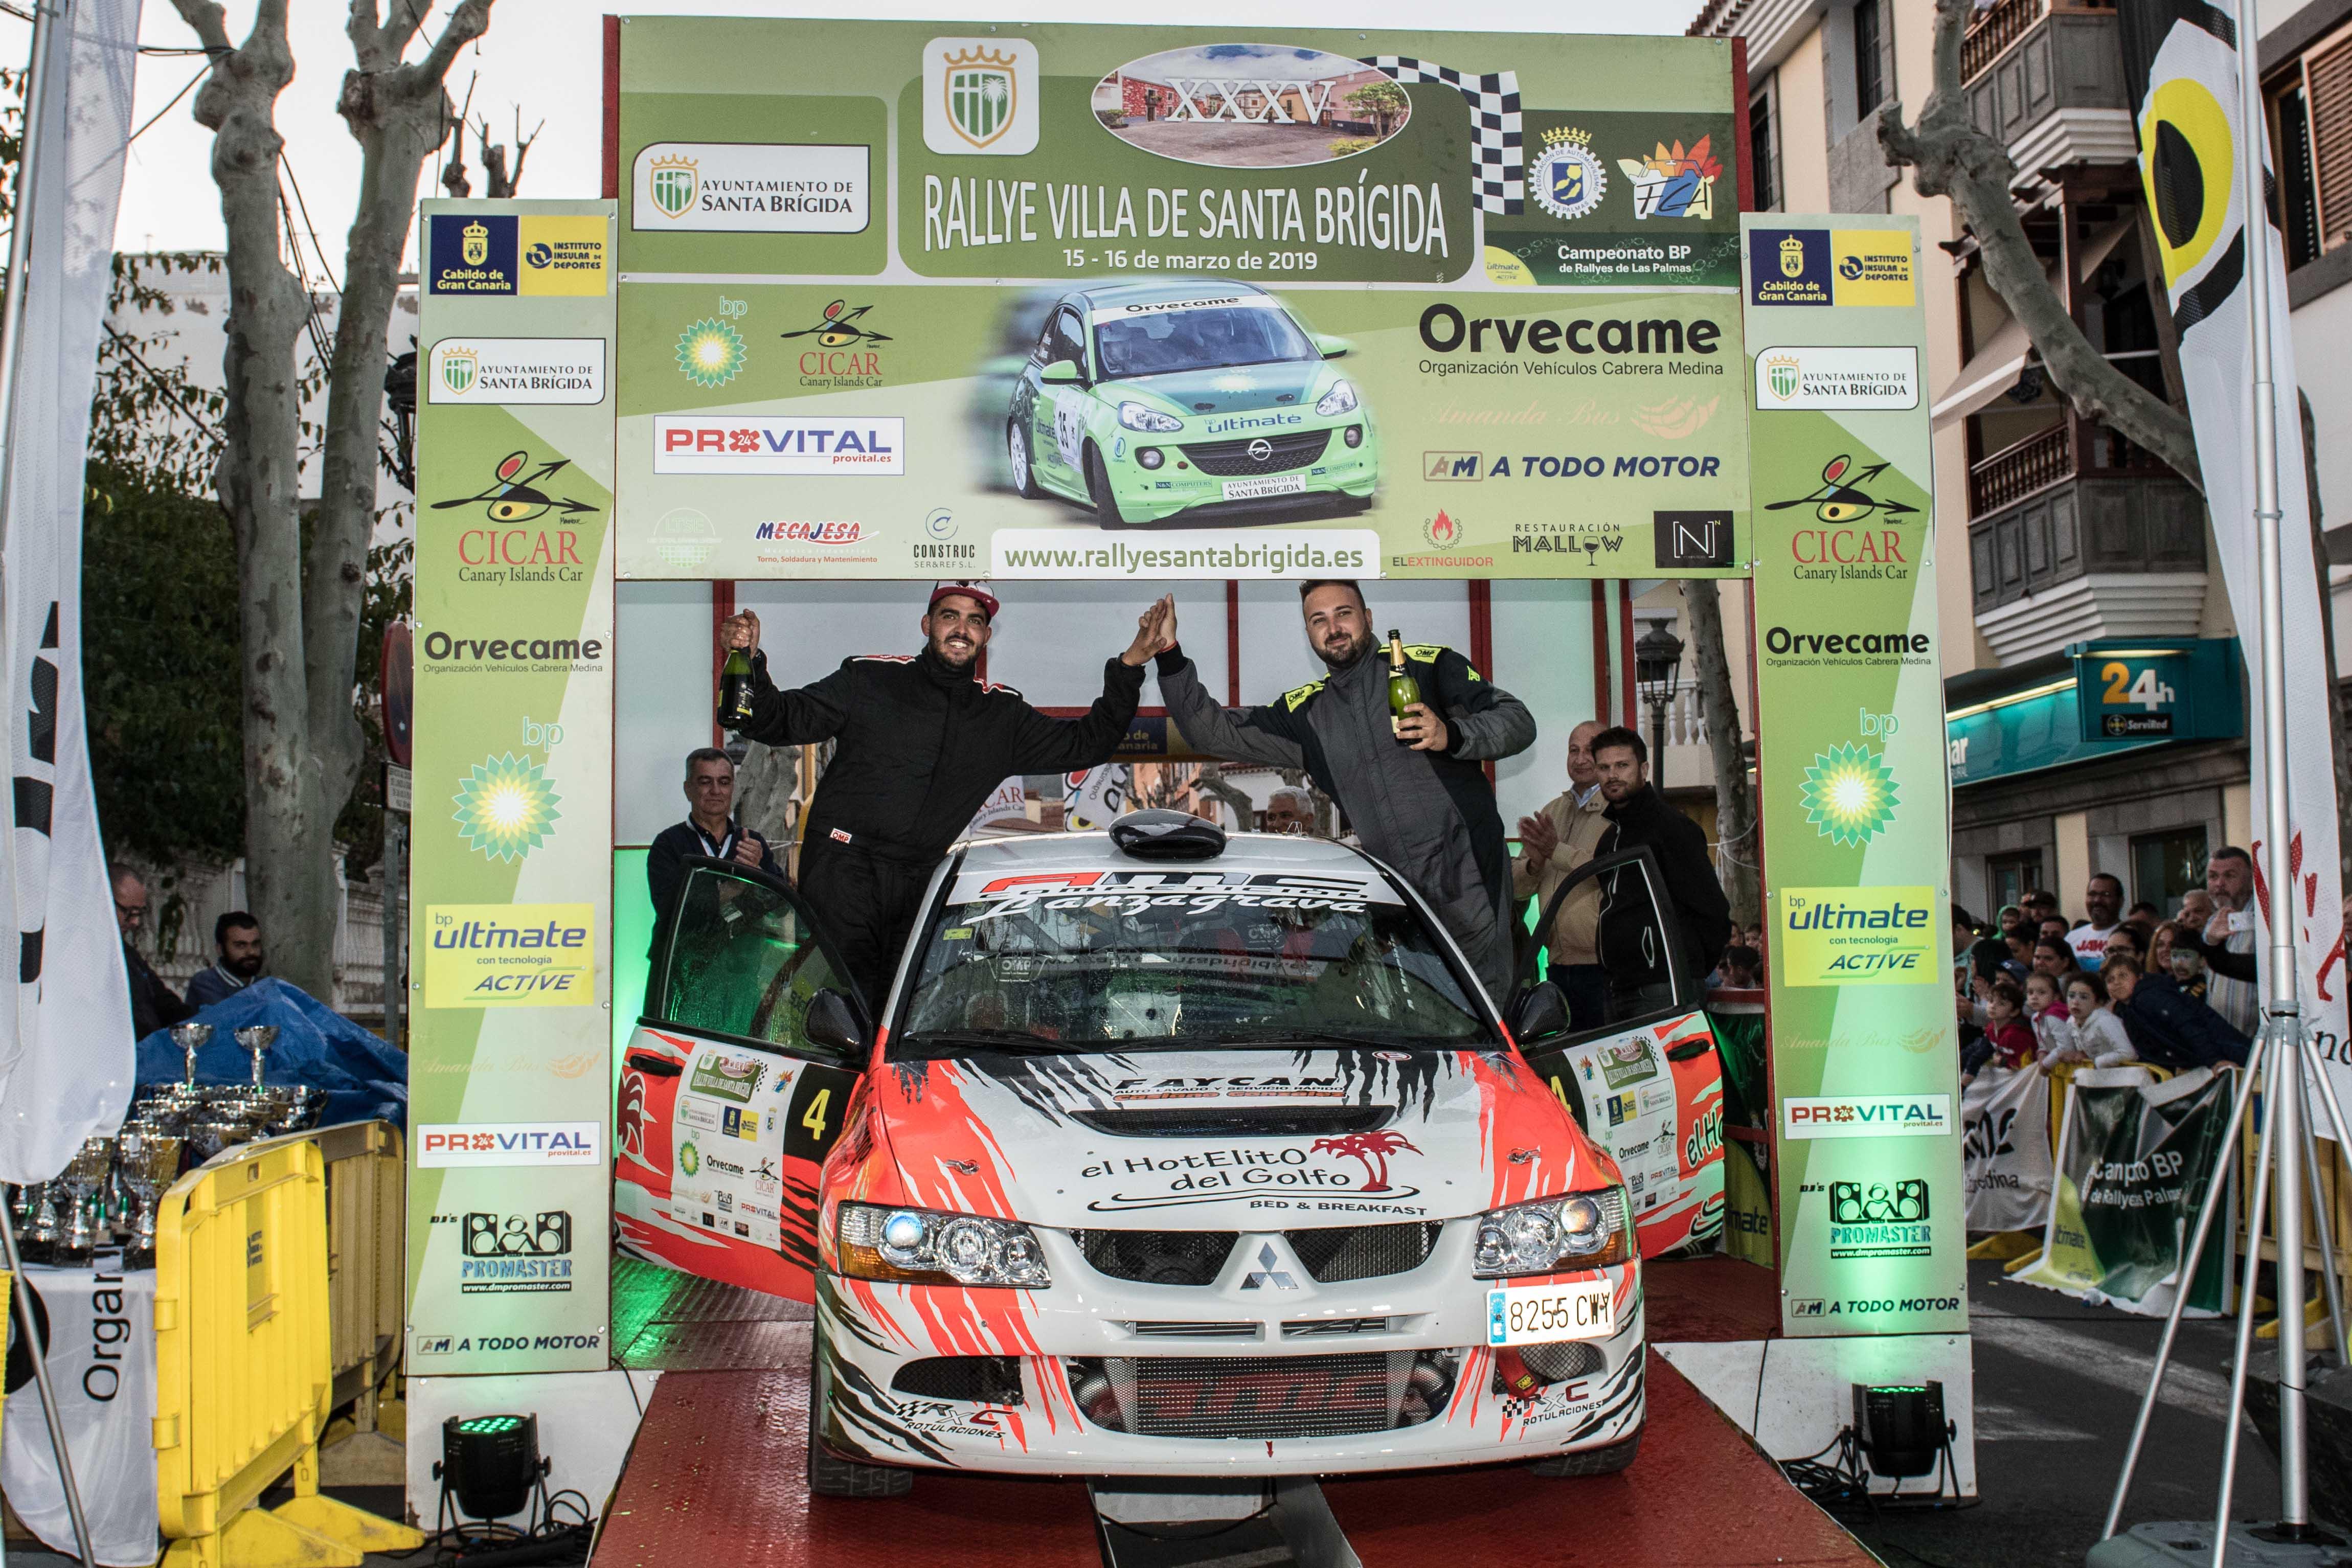 📢 Aníbal Machín-Jorge Cedrés, dominio de principio a fin en  el XXXV Rallye Villa de Santa Brígida